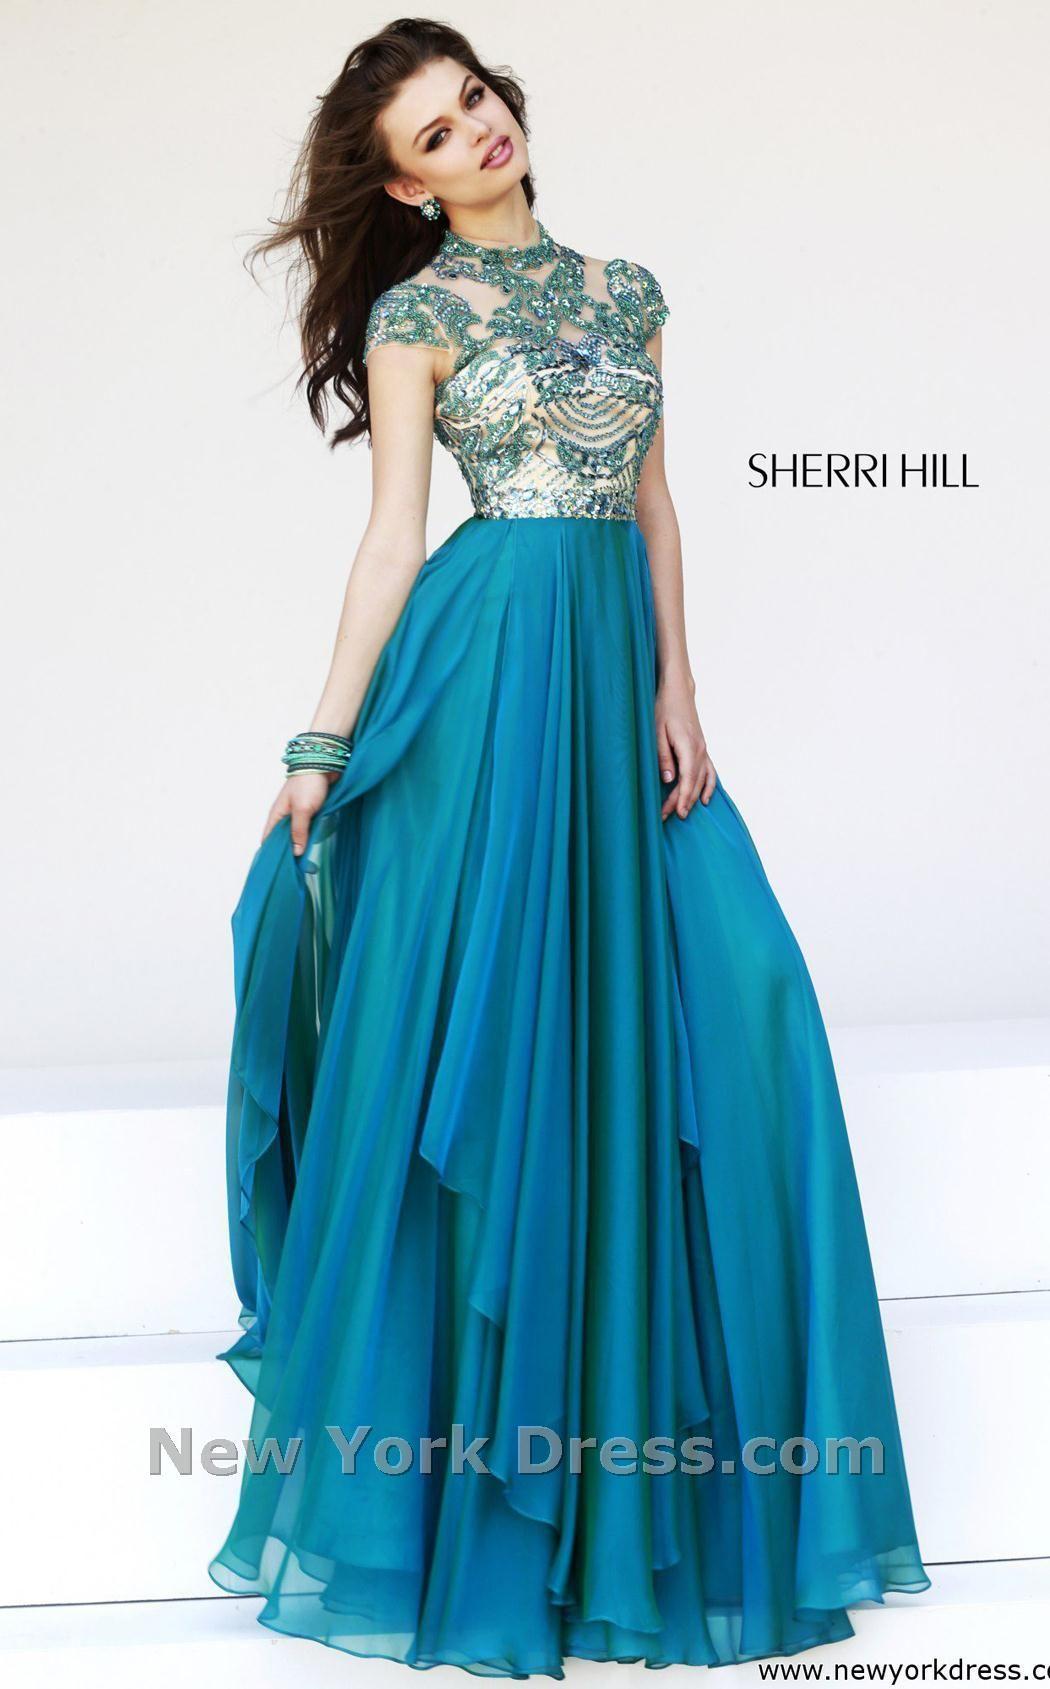 Sherri Hill Sherri Hill Dresses | Fashion | Pinterest | Prom, Formal ...